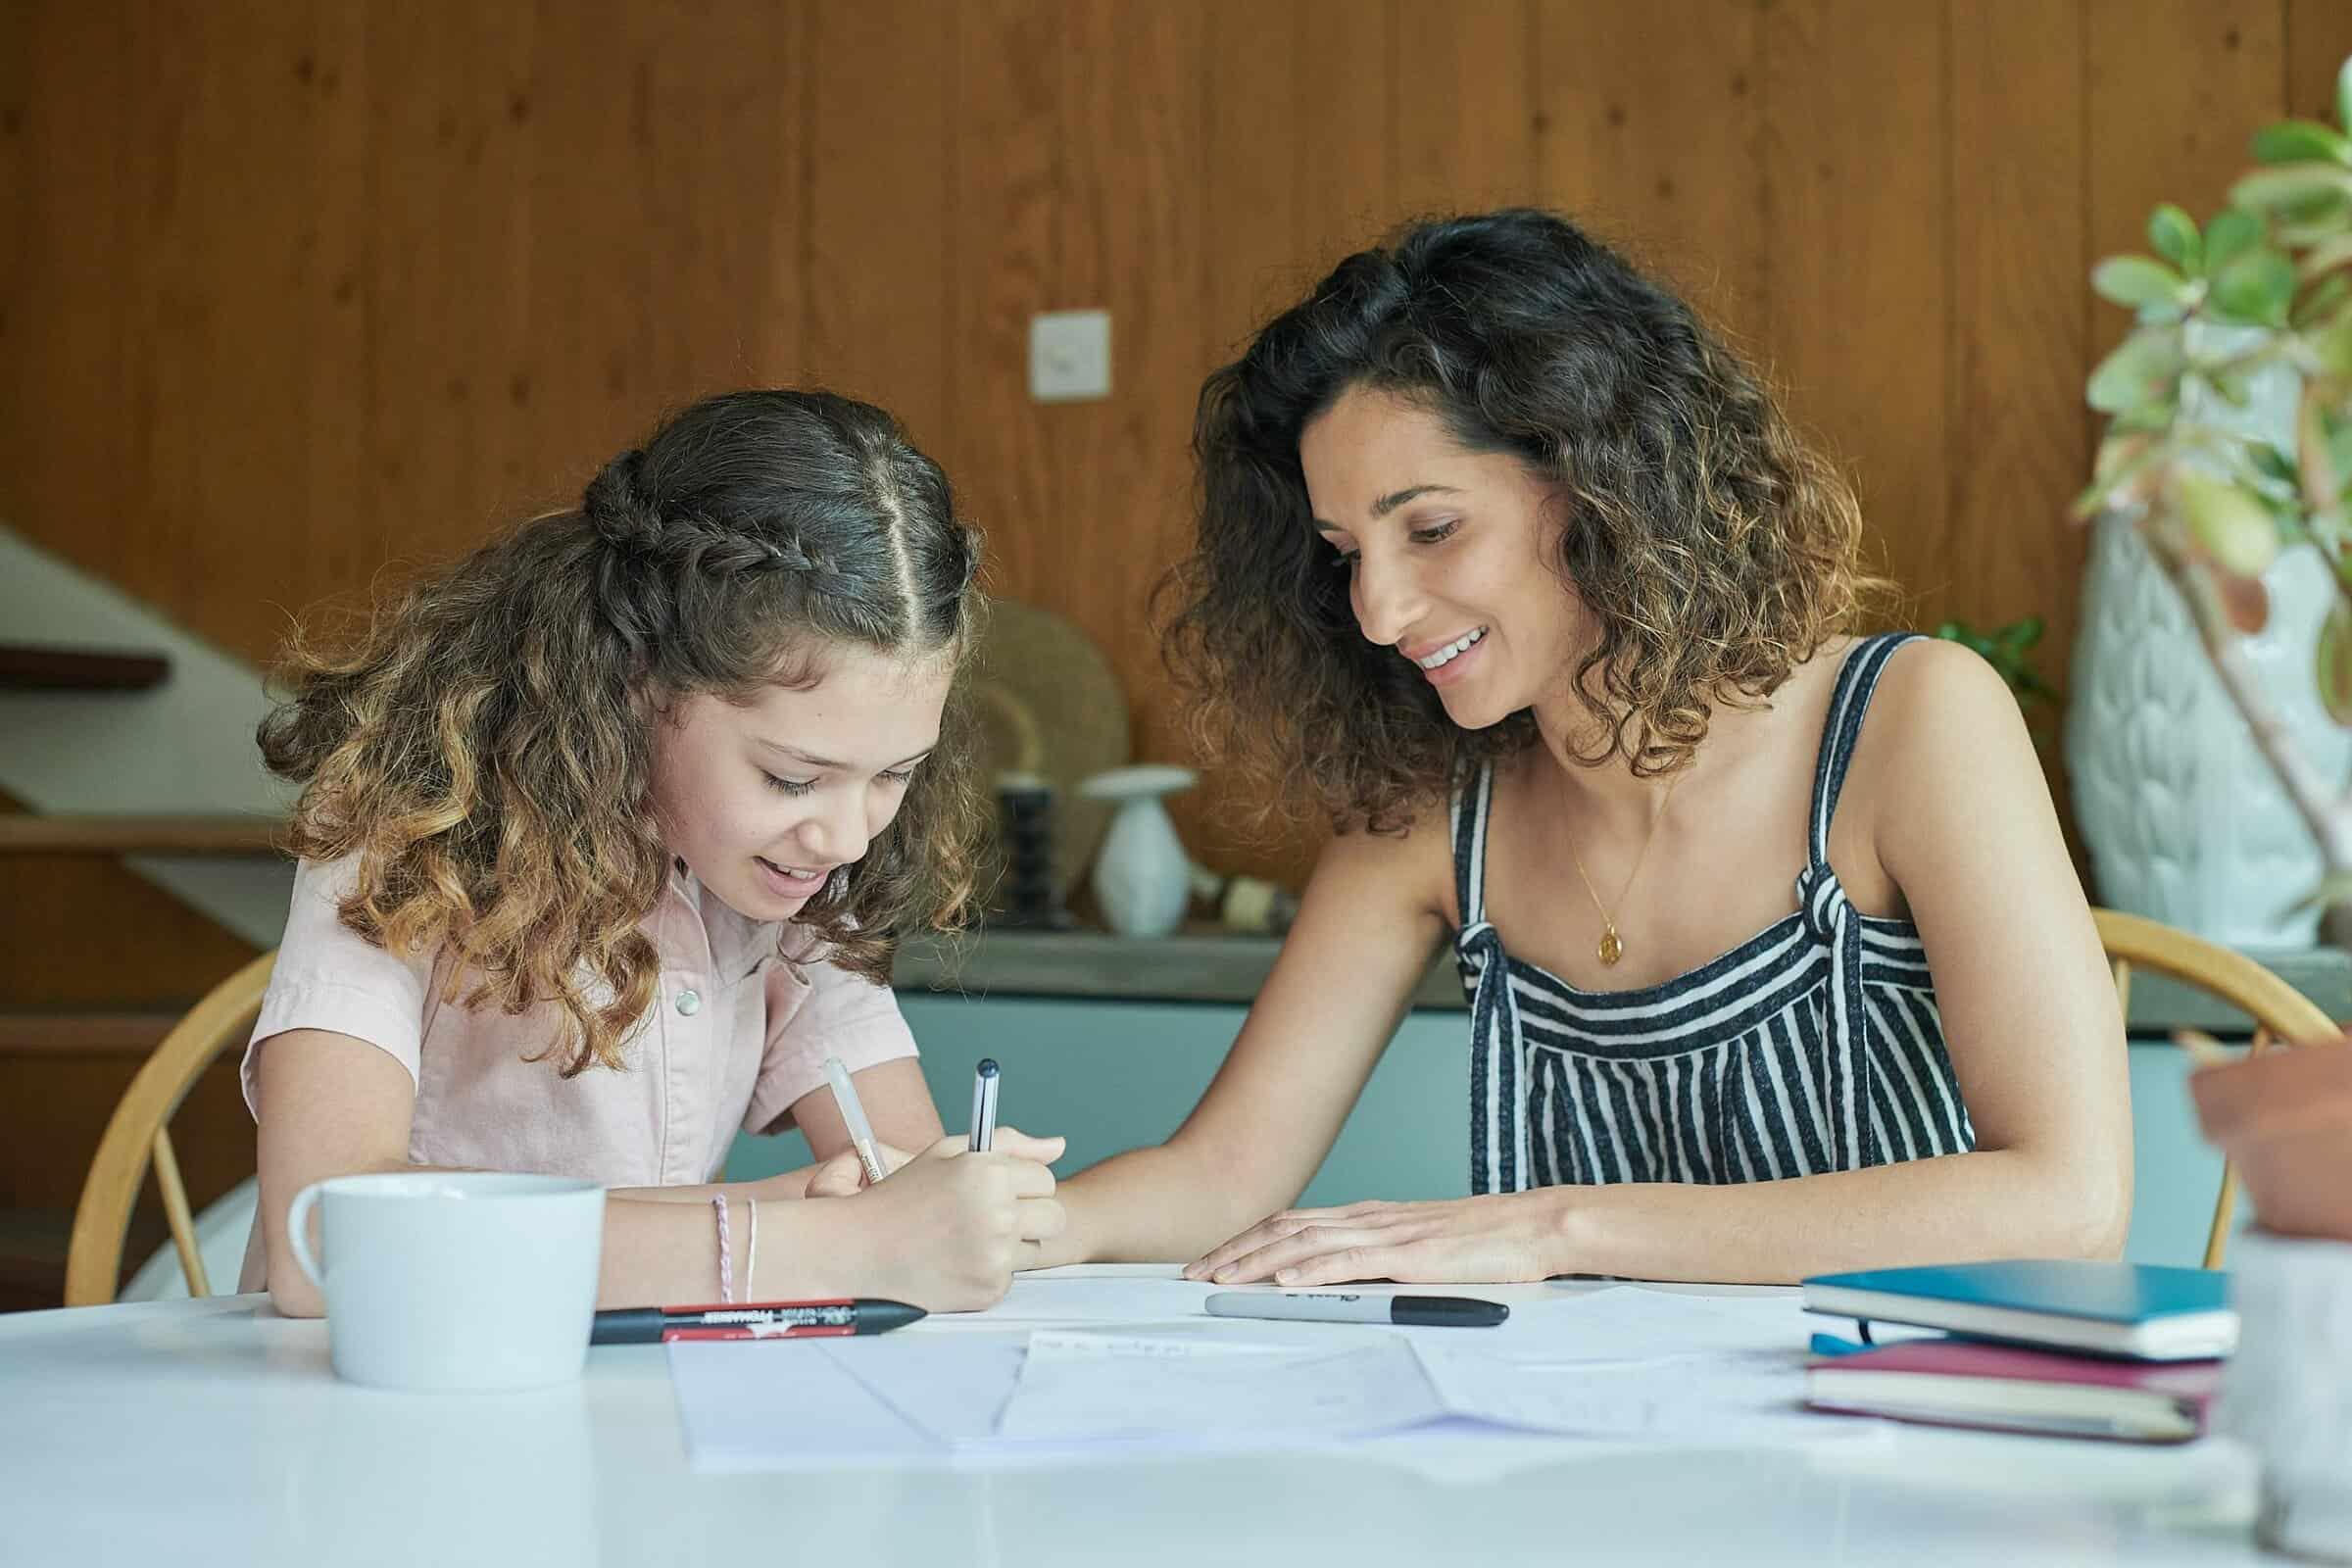 Parents: before requesting furlough, consider childcare